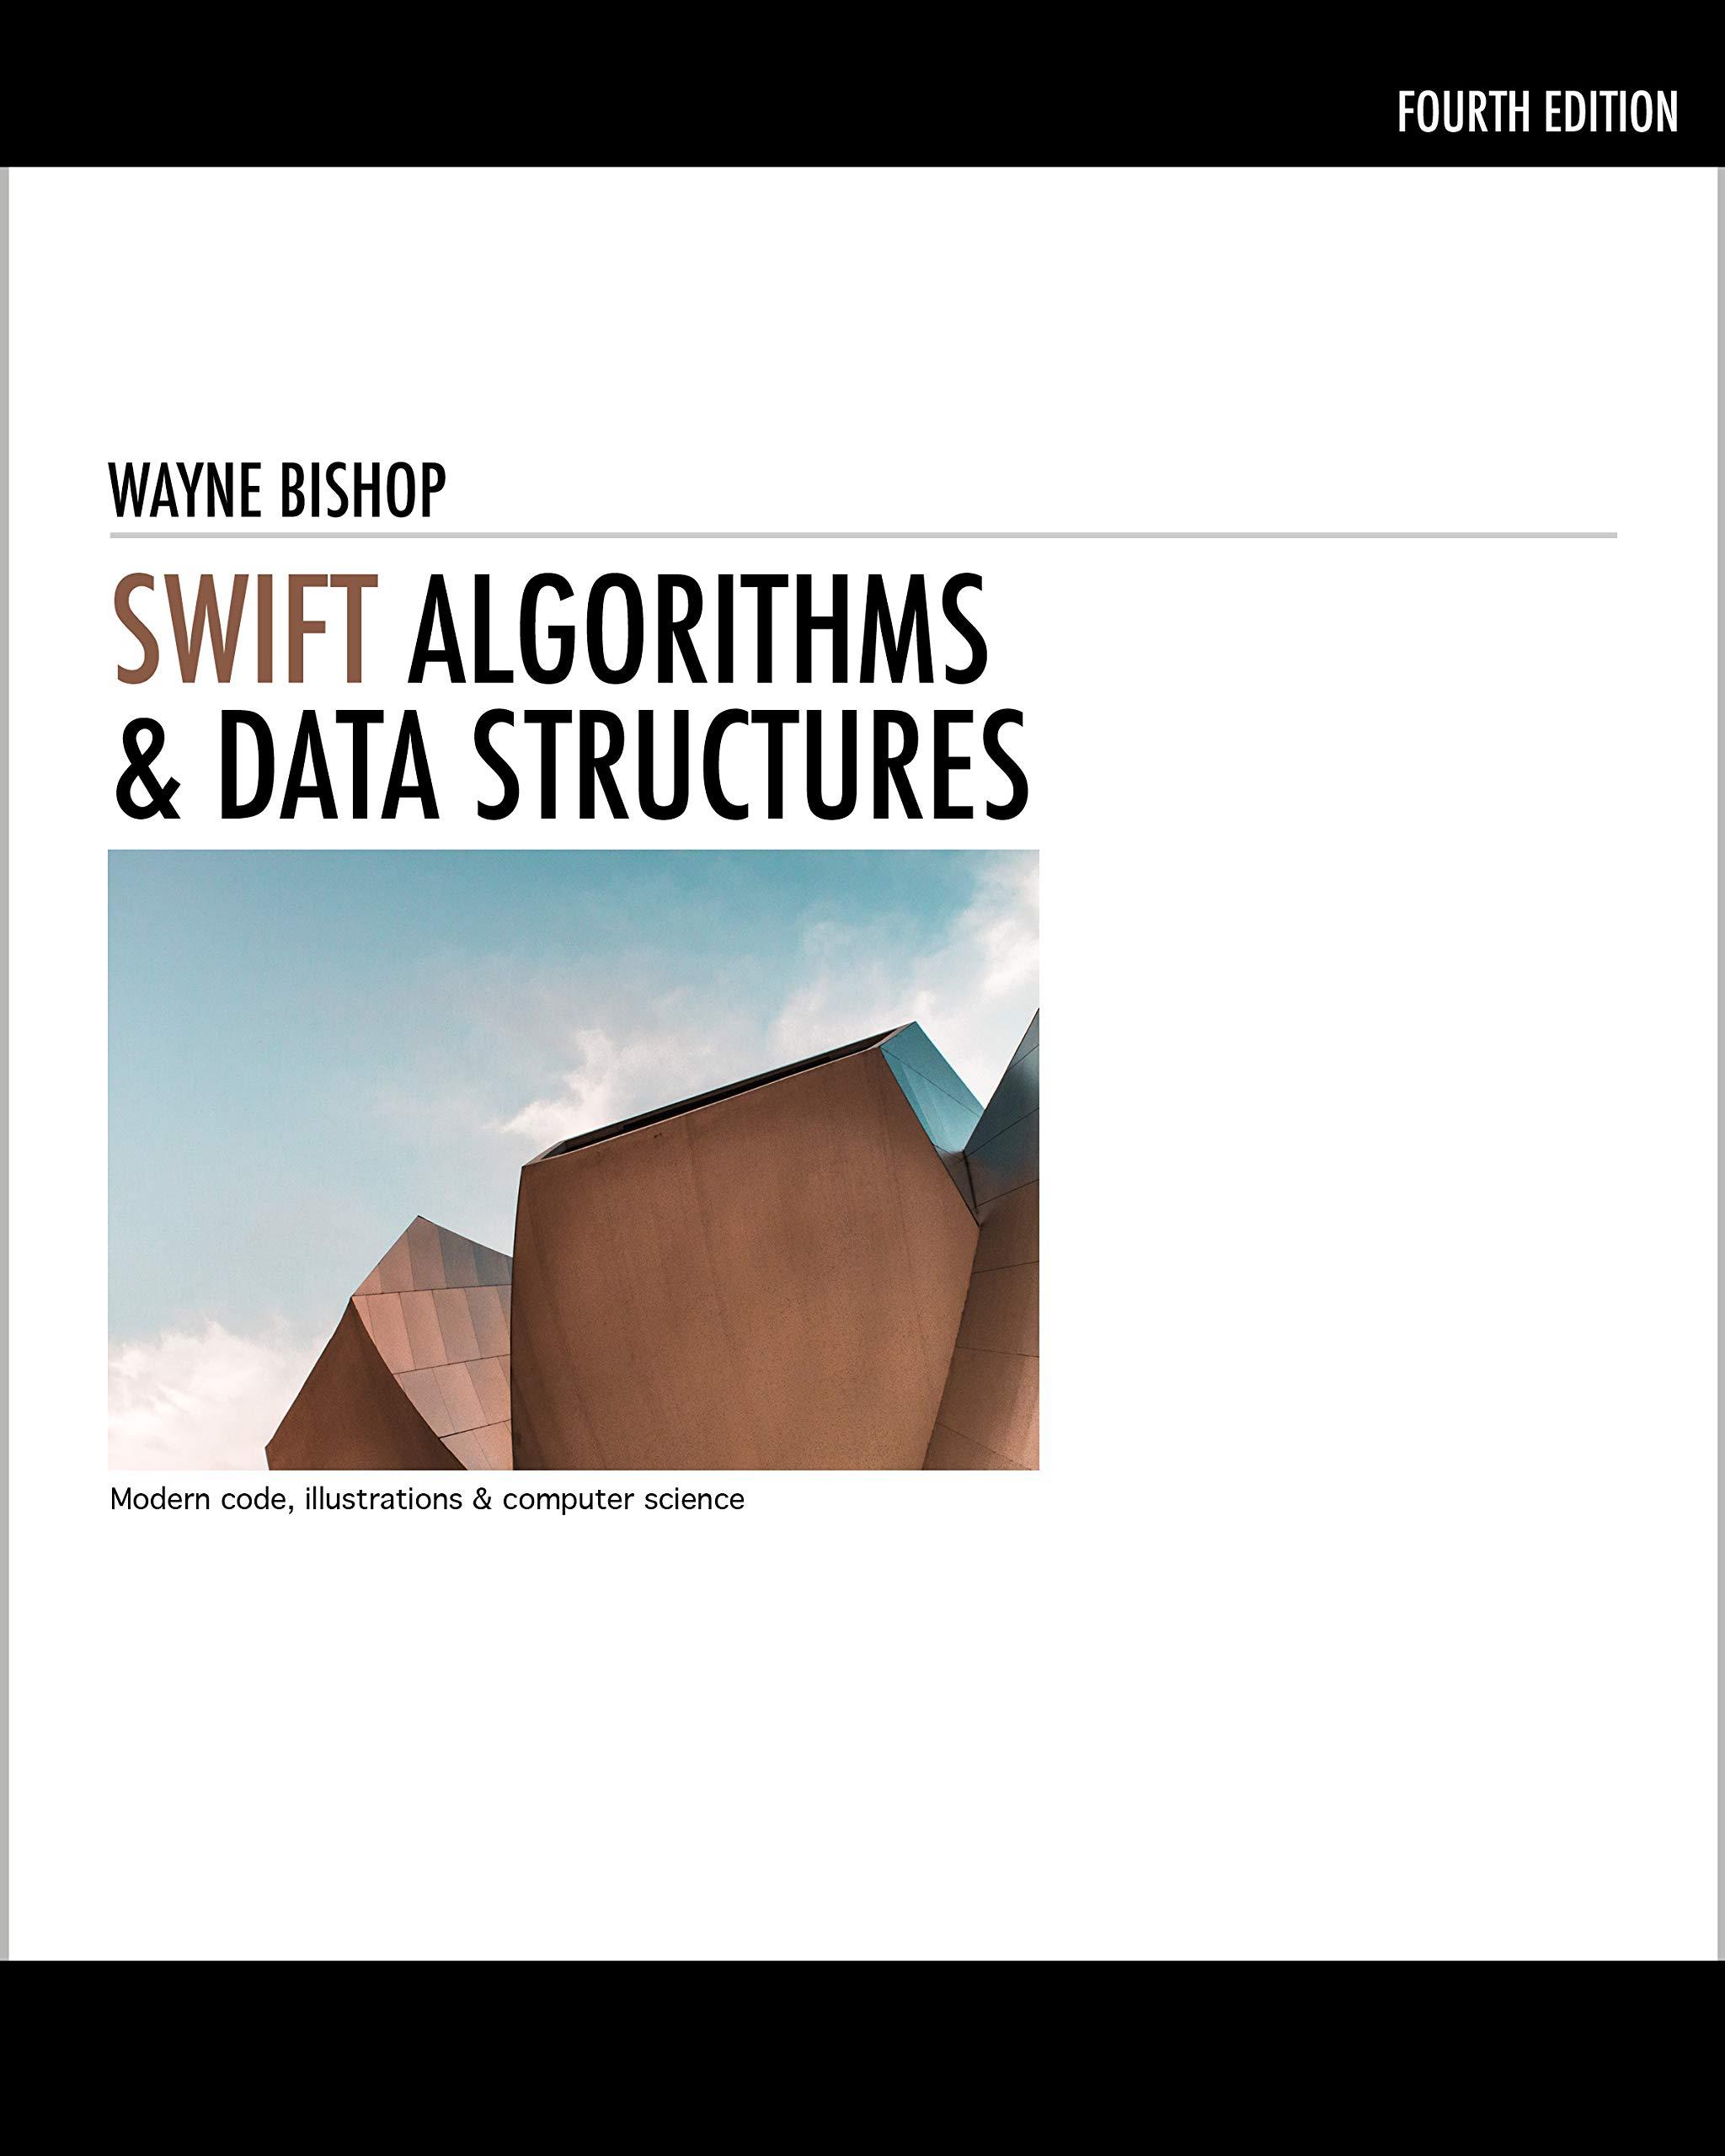 Swift Algorithms & Data Structures: Modern code, illustrations & computer science